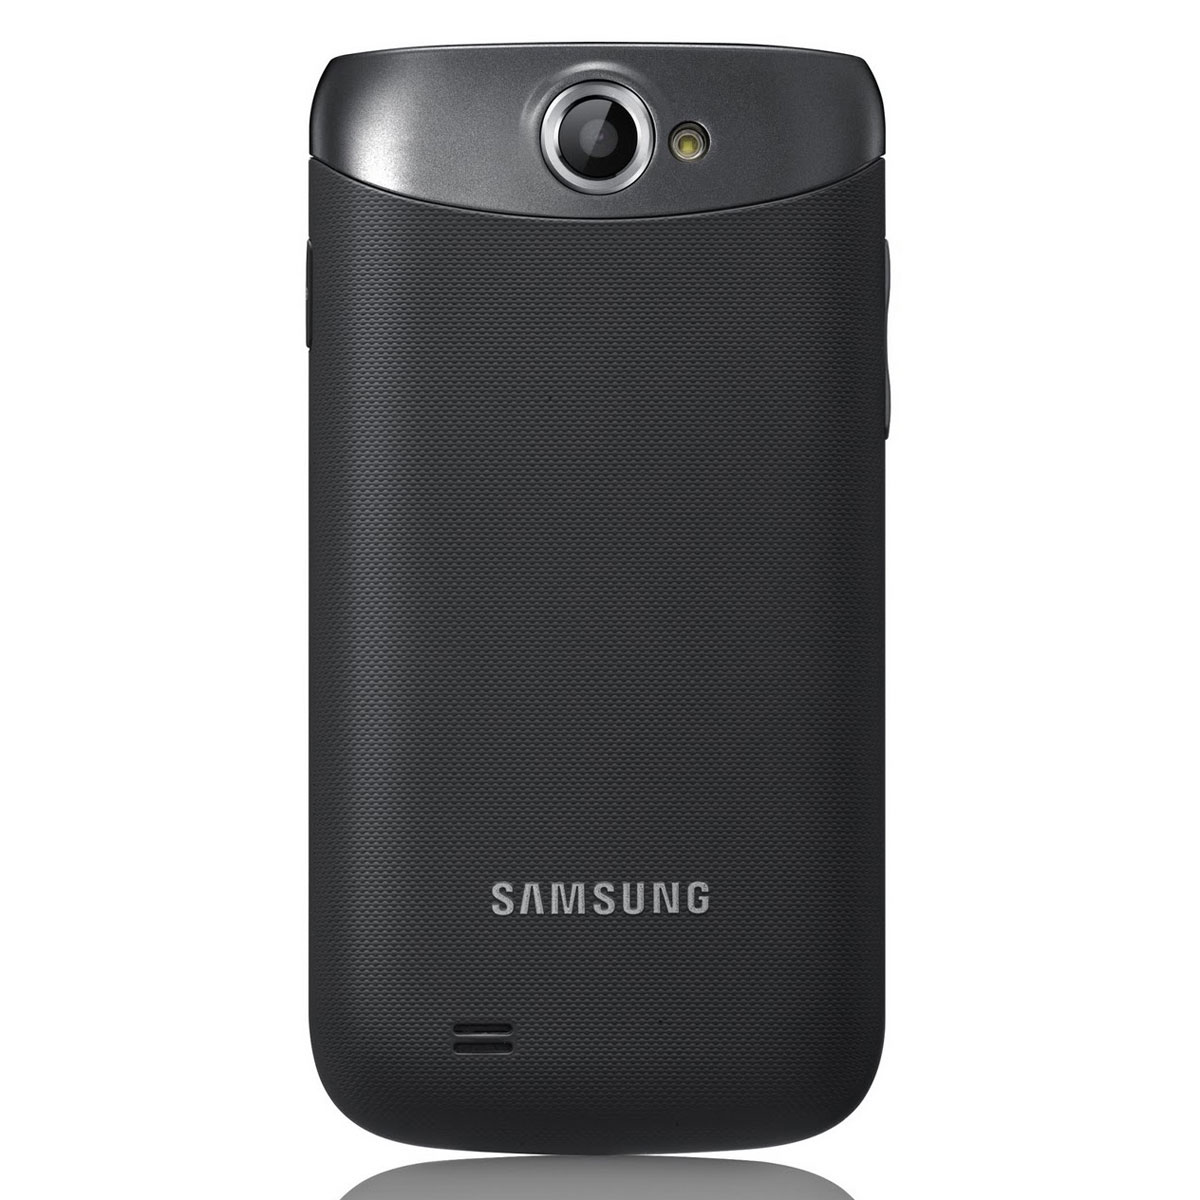 samsung galaxy w gt i8150 mobile smartphone samsung sur. Black Bedroom Furniture Sets. Home Design Ideas